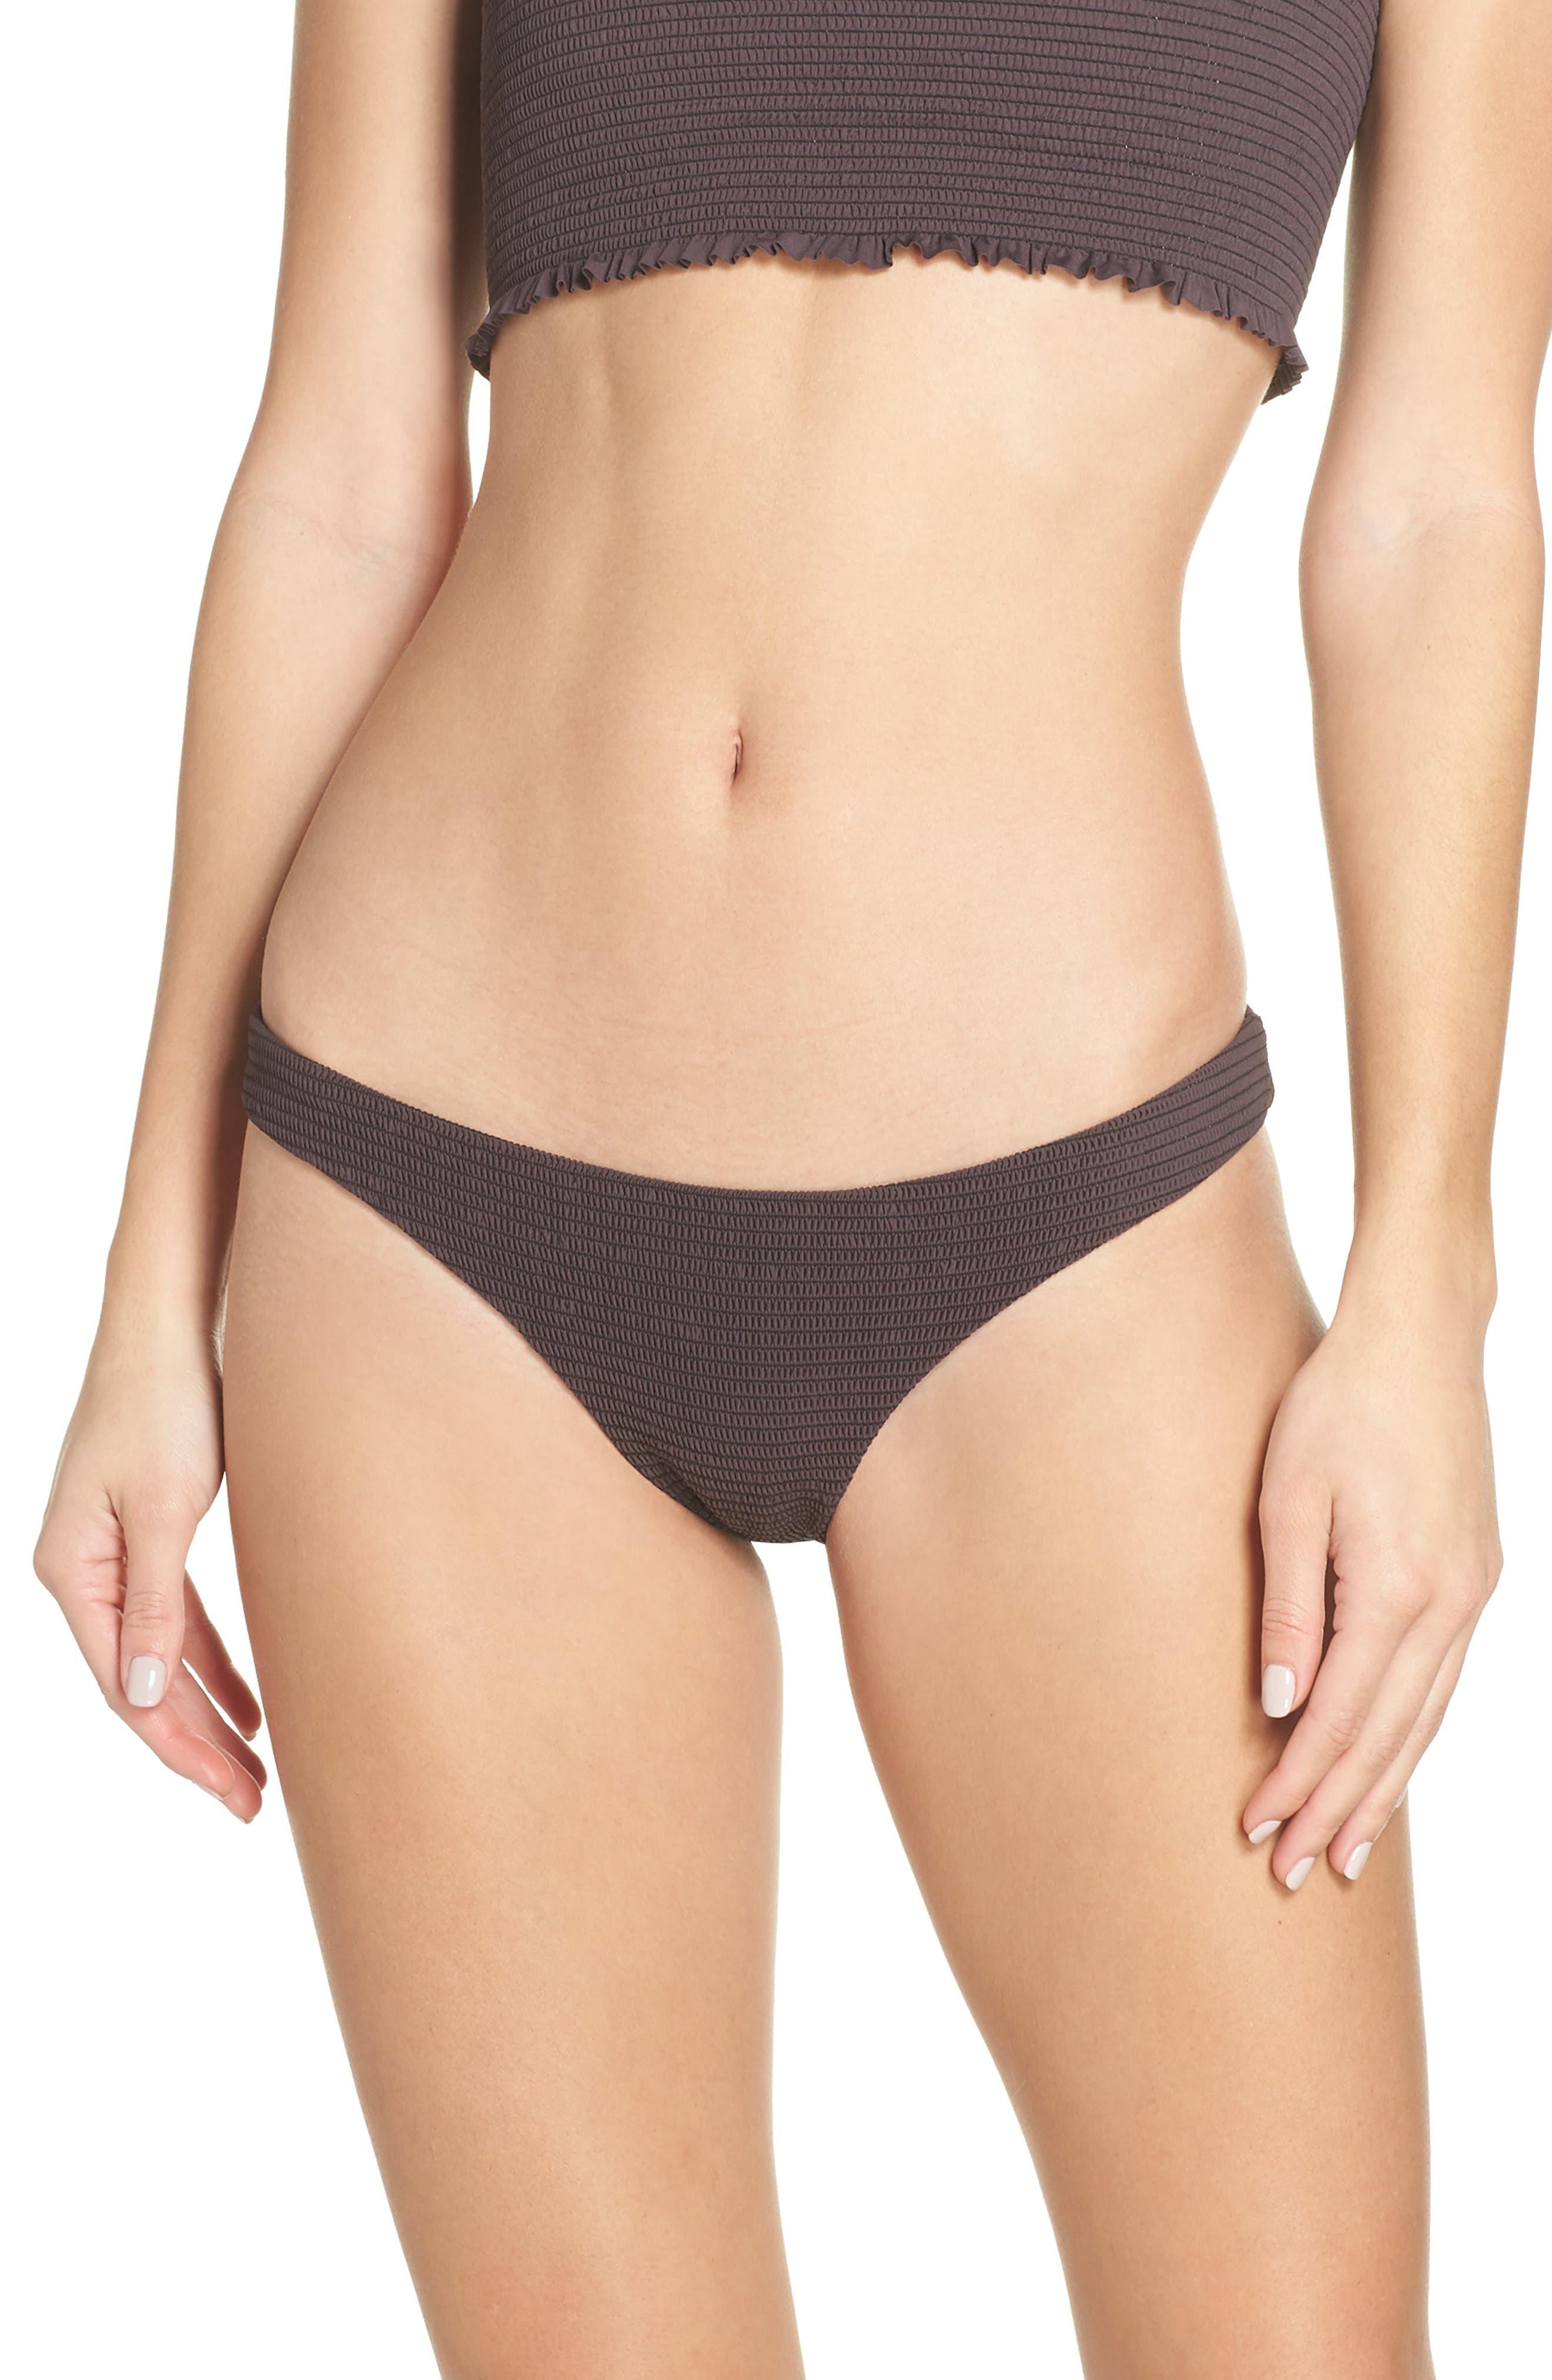 Pilyq Smocked Bikini Bottoms, Brown